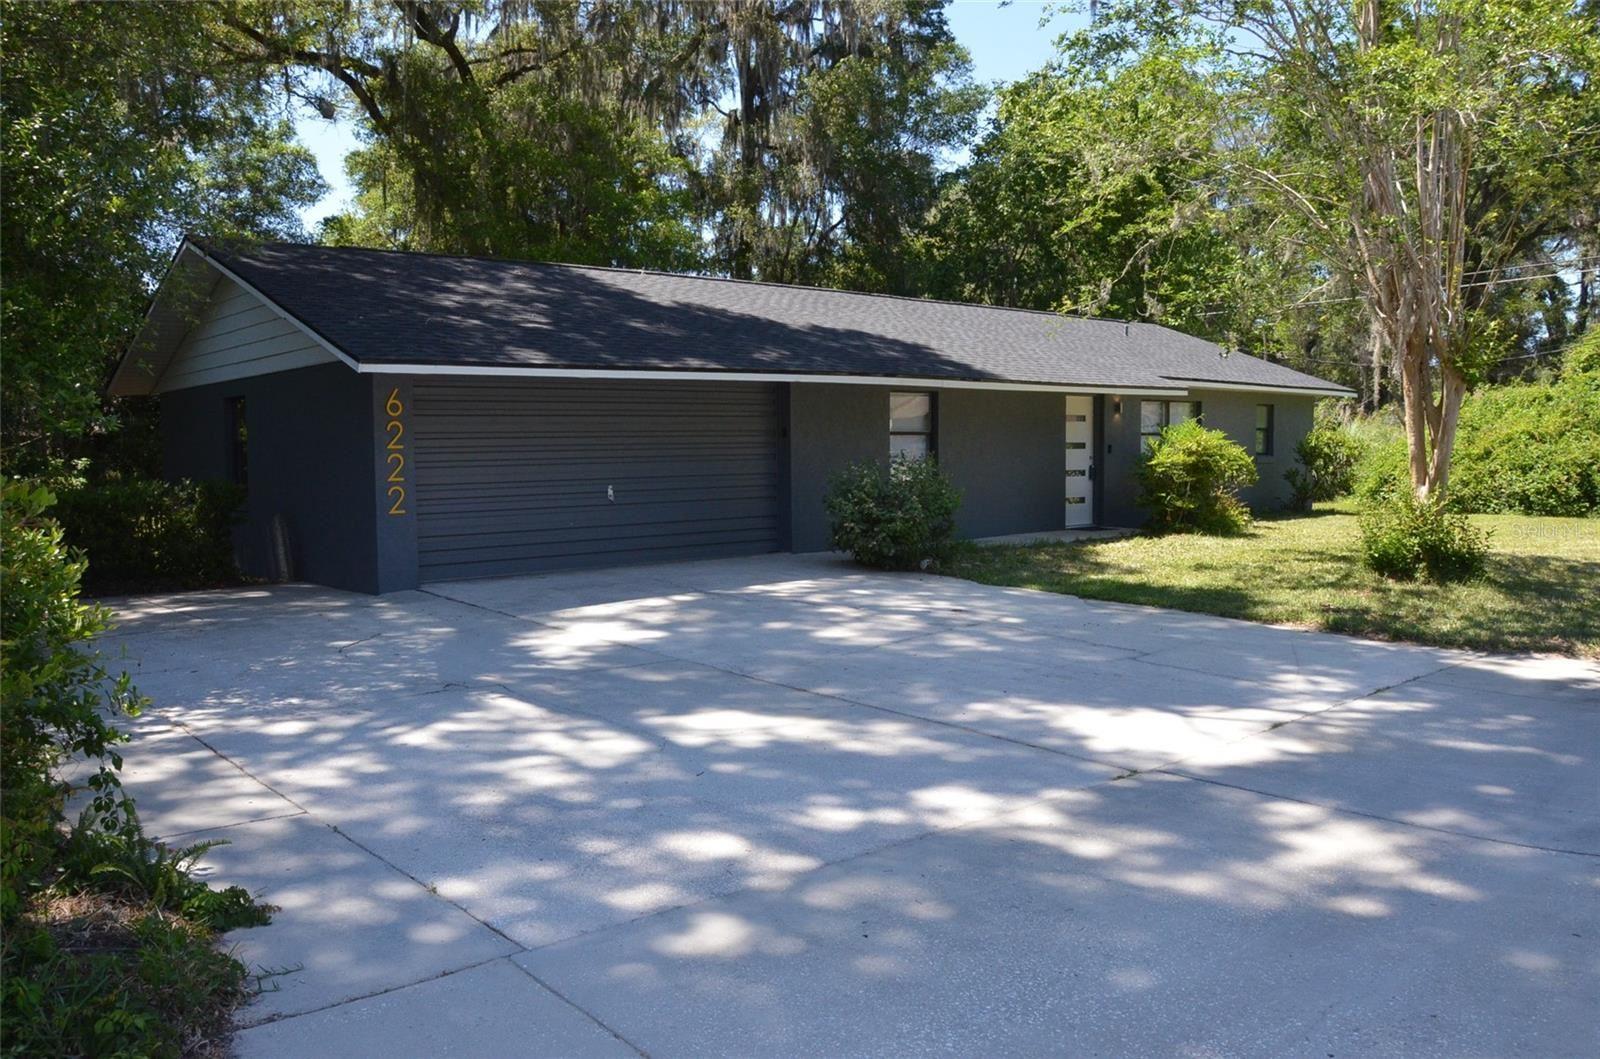 Photo of 6222 NW 53RD COURT, OCALA, FL 34482 (MLS # OM619863)